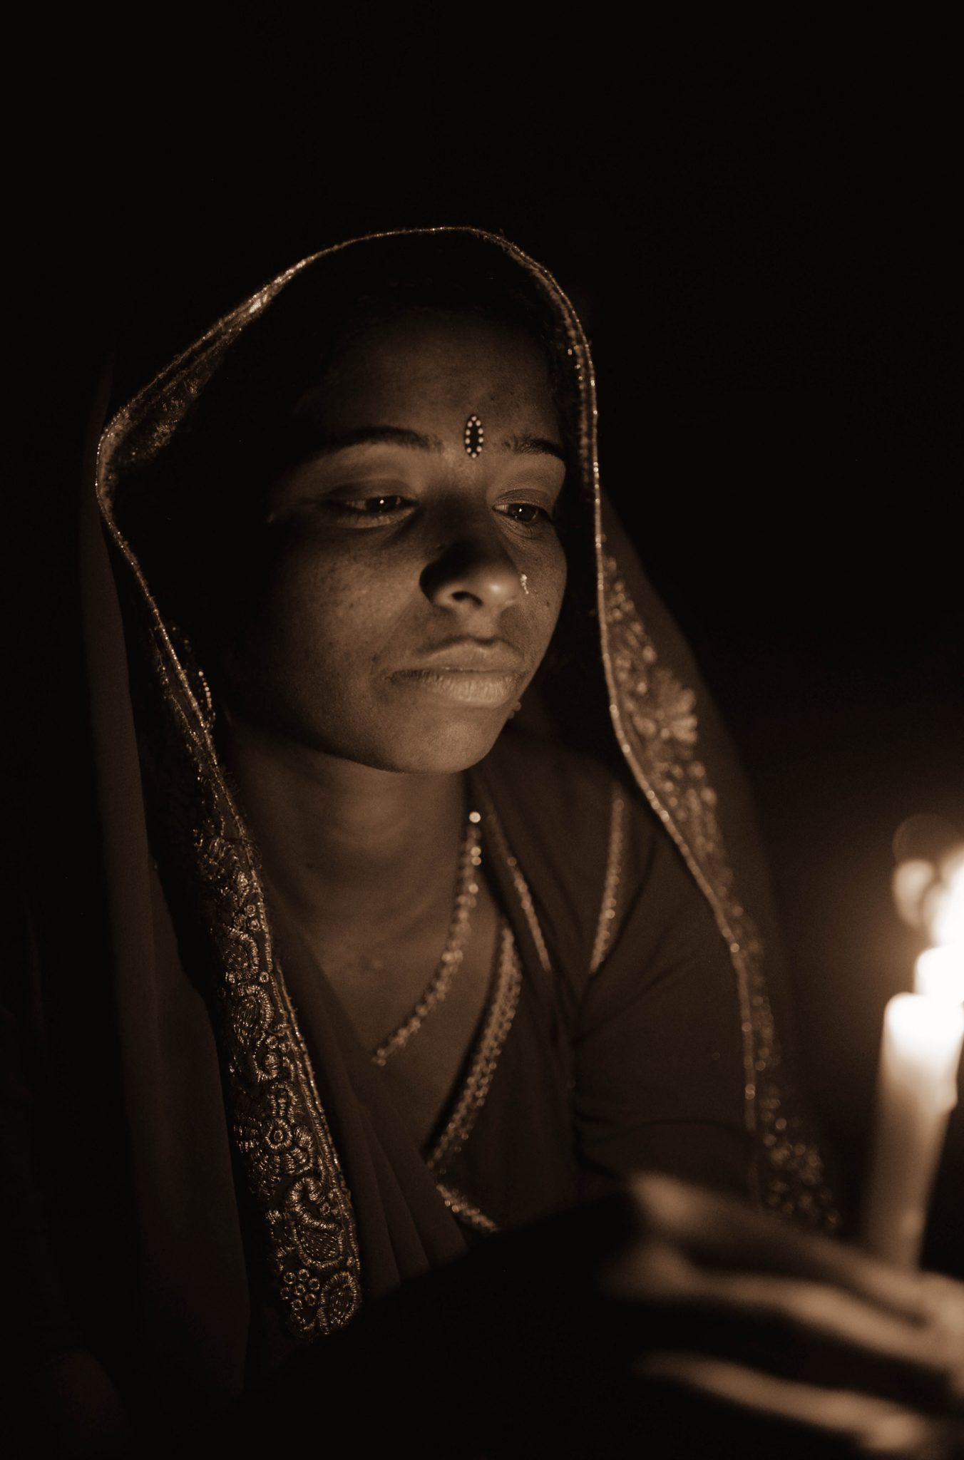 A woman in Pushkar, Rajasthan